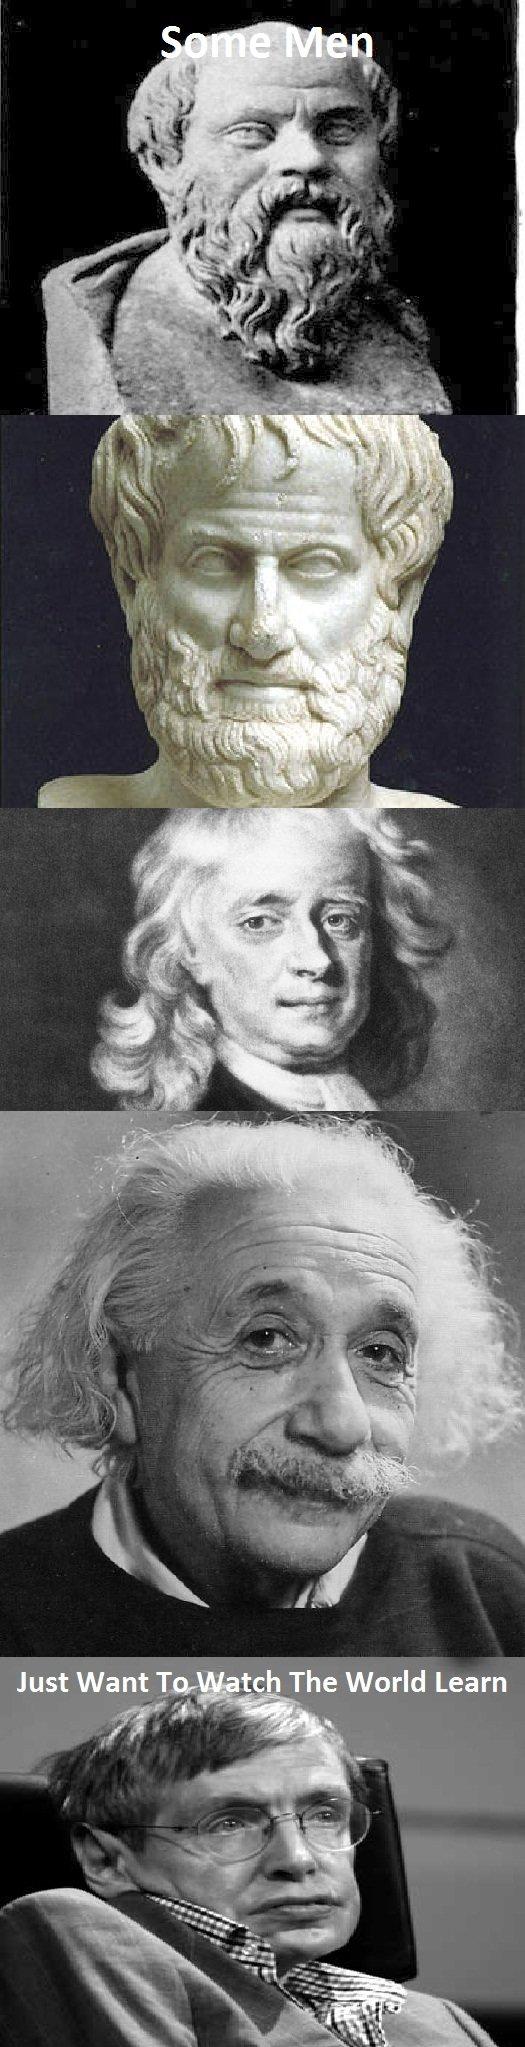 Some Men. 1. Socrates 2. Aristotle 3.Newton 4.Einstein 5.Hawking. The World Learn off the chart Paint skills